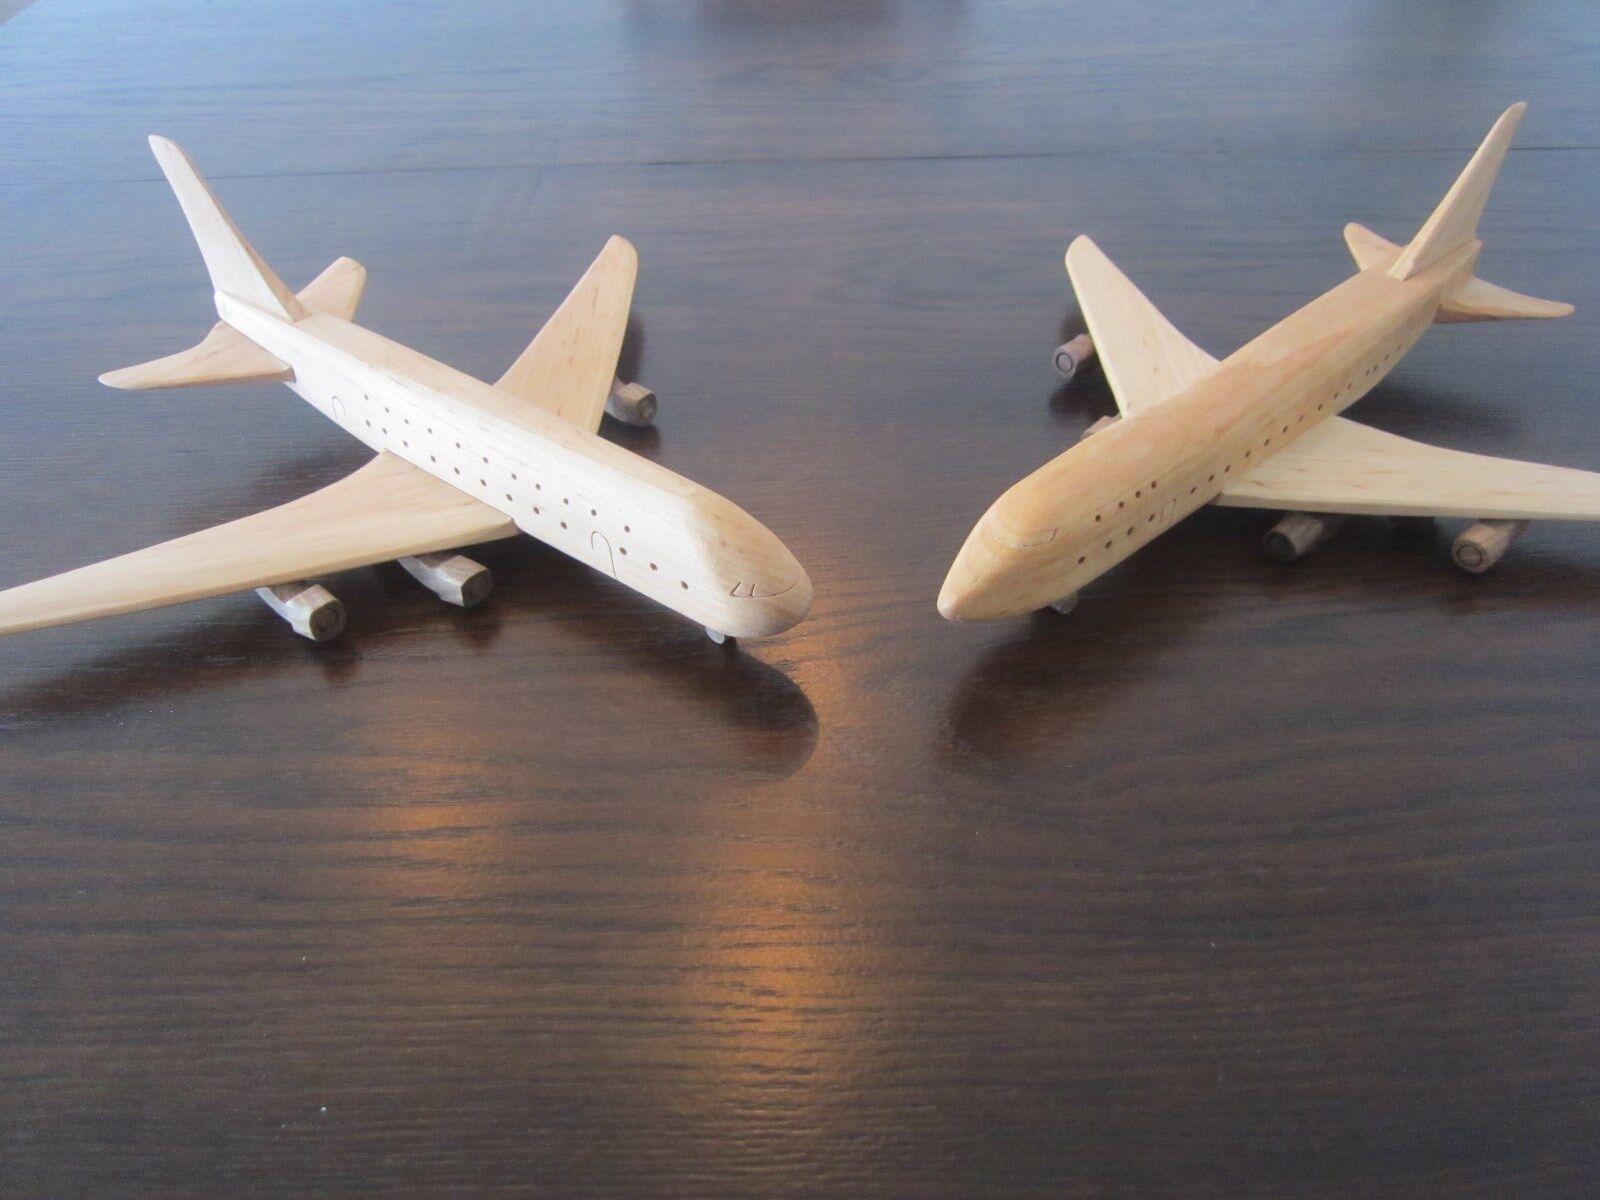 Airbus A380 A380 A380 Boeing 747 Jumbo Jet Jumbojet Passagierflugzeug  Flugzeug HANDARBEIT 566d56